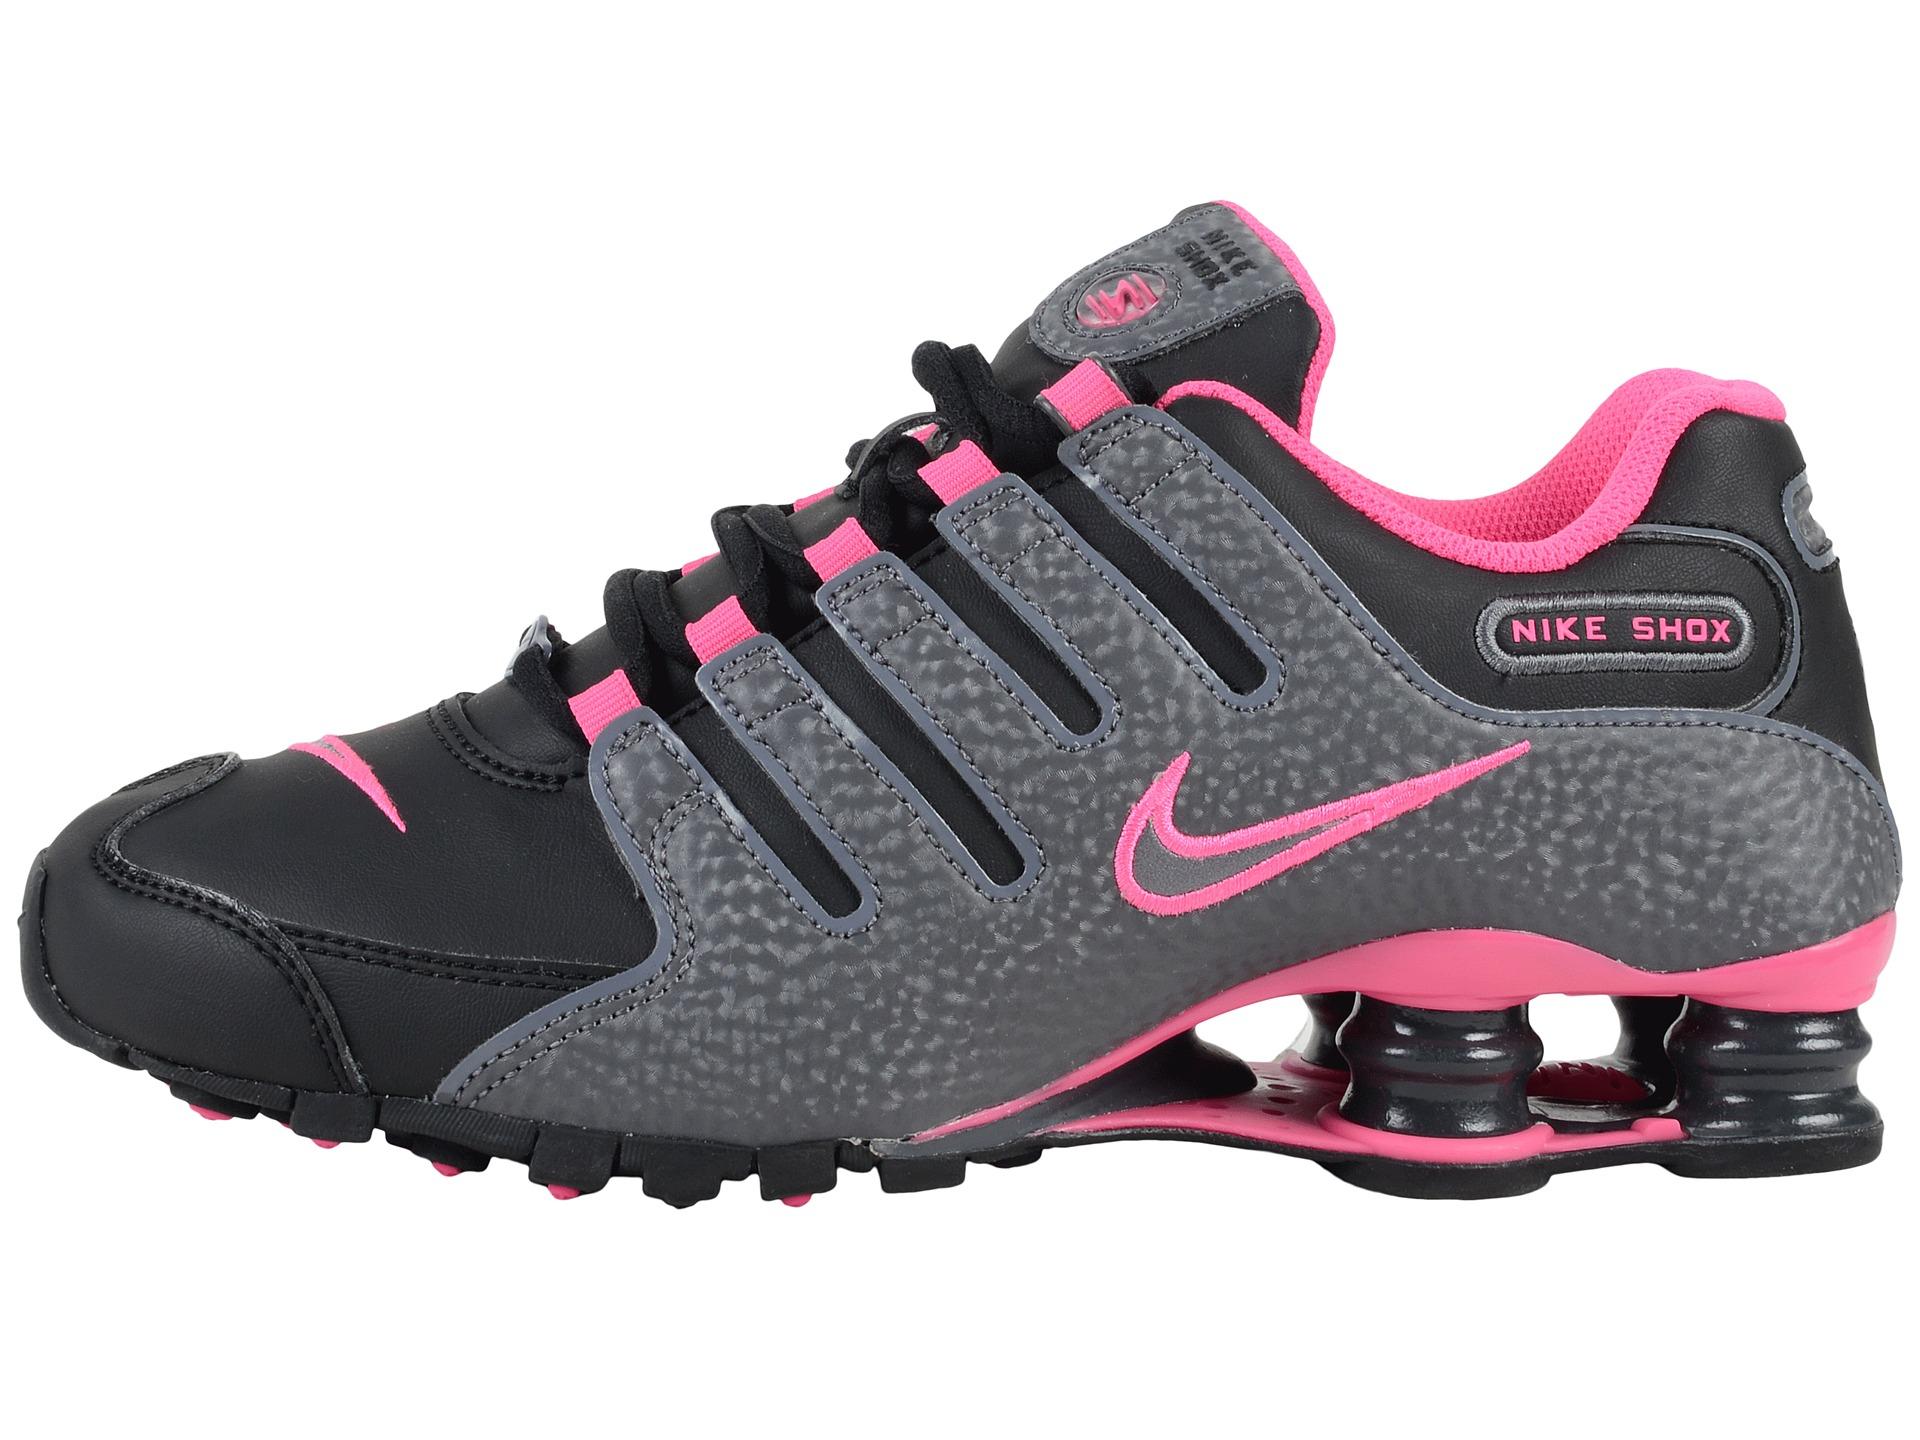 Lyst - Nike Shox Nz in Pink 680e34877